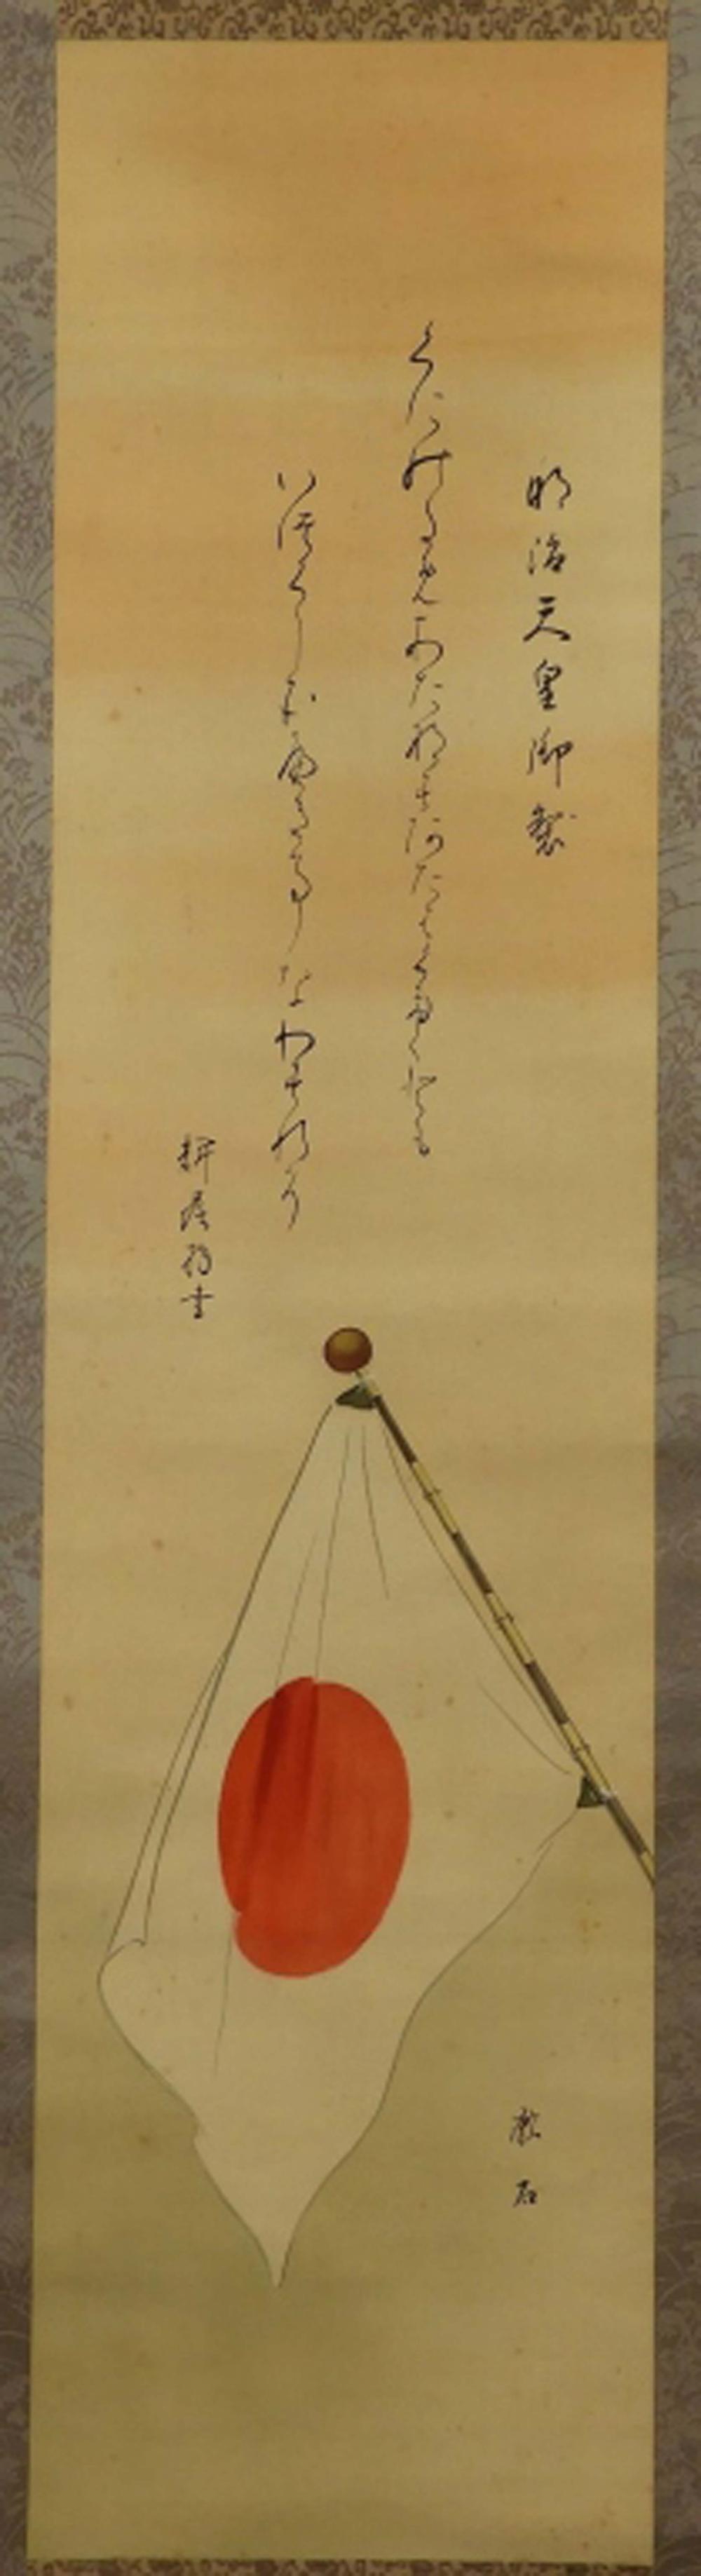 Japanese Calligraphic Rising Sun Scroll Painting